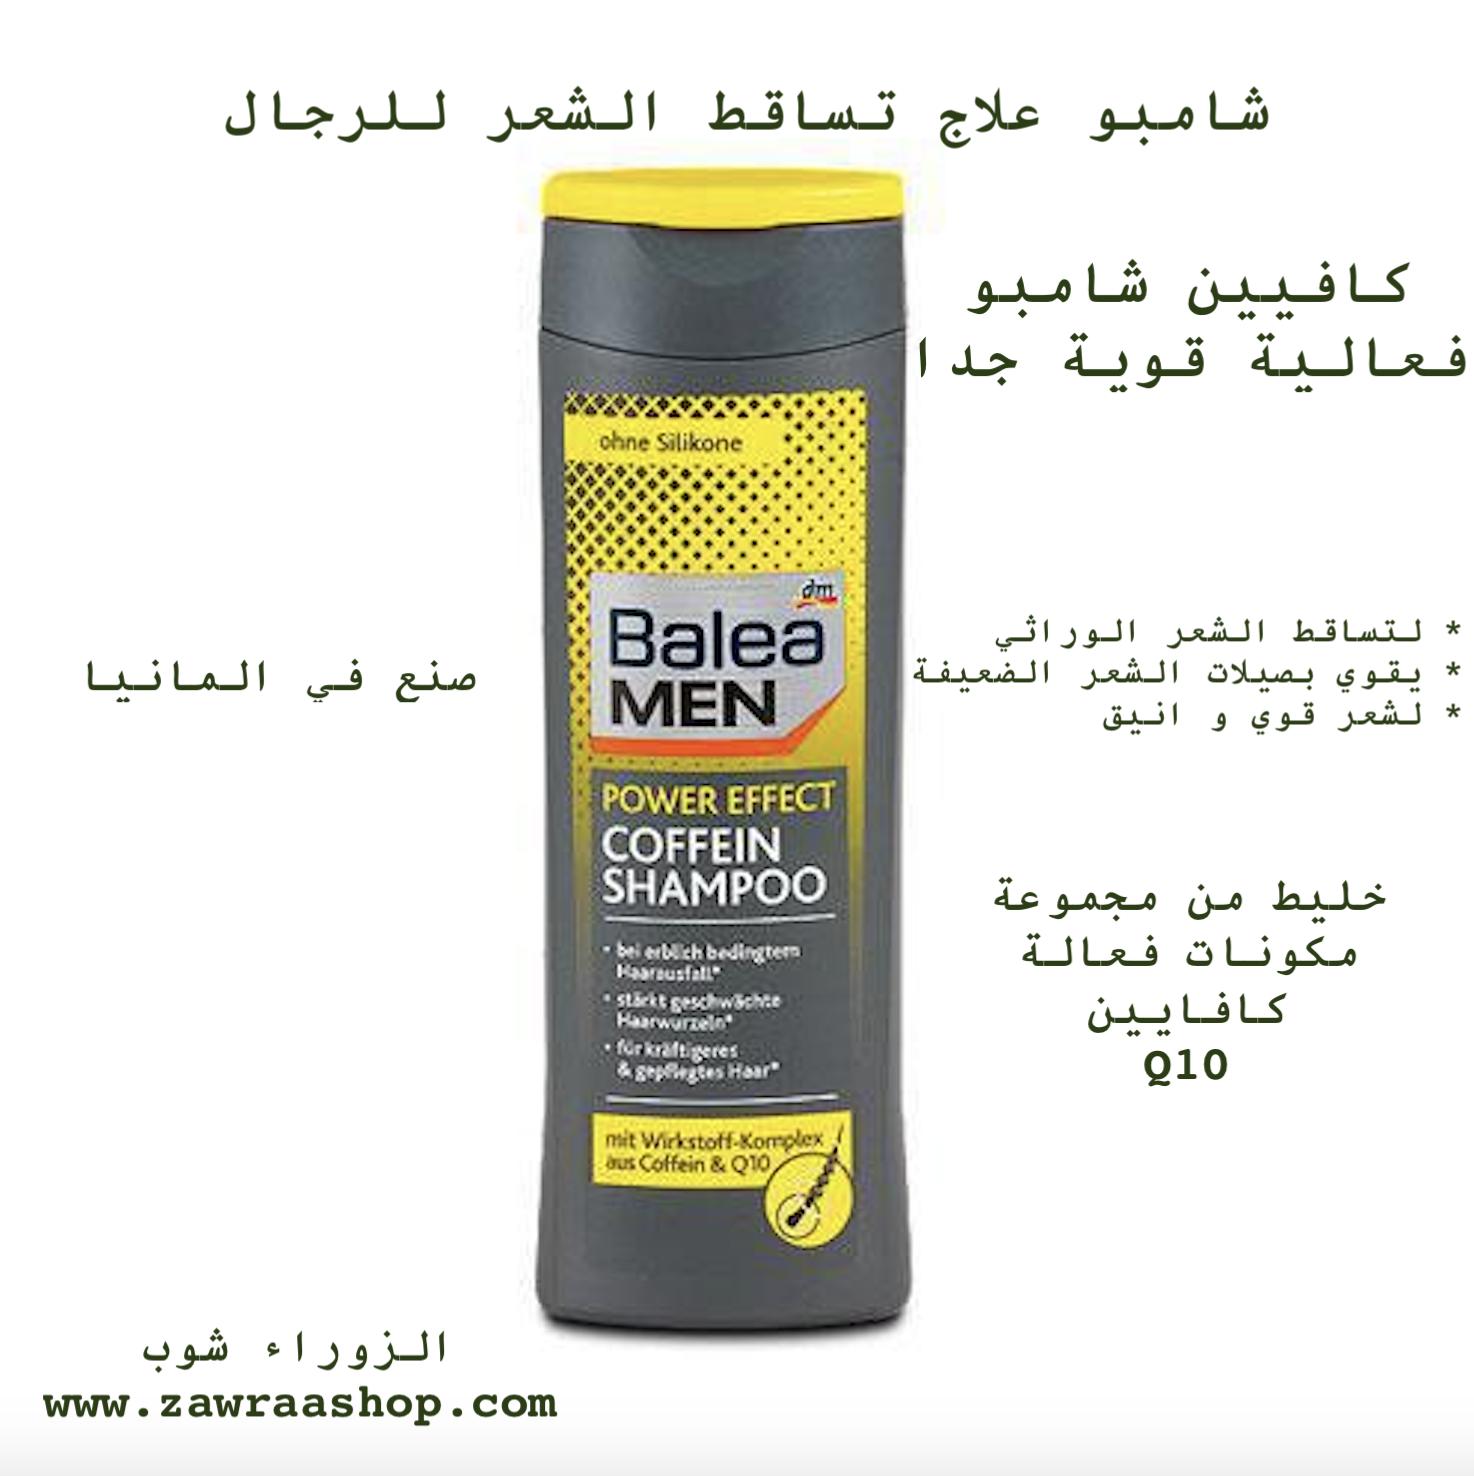 B404 men Coffein Shampoo 250ml شامبو رجالي ضد التساقط 00442